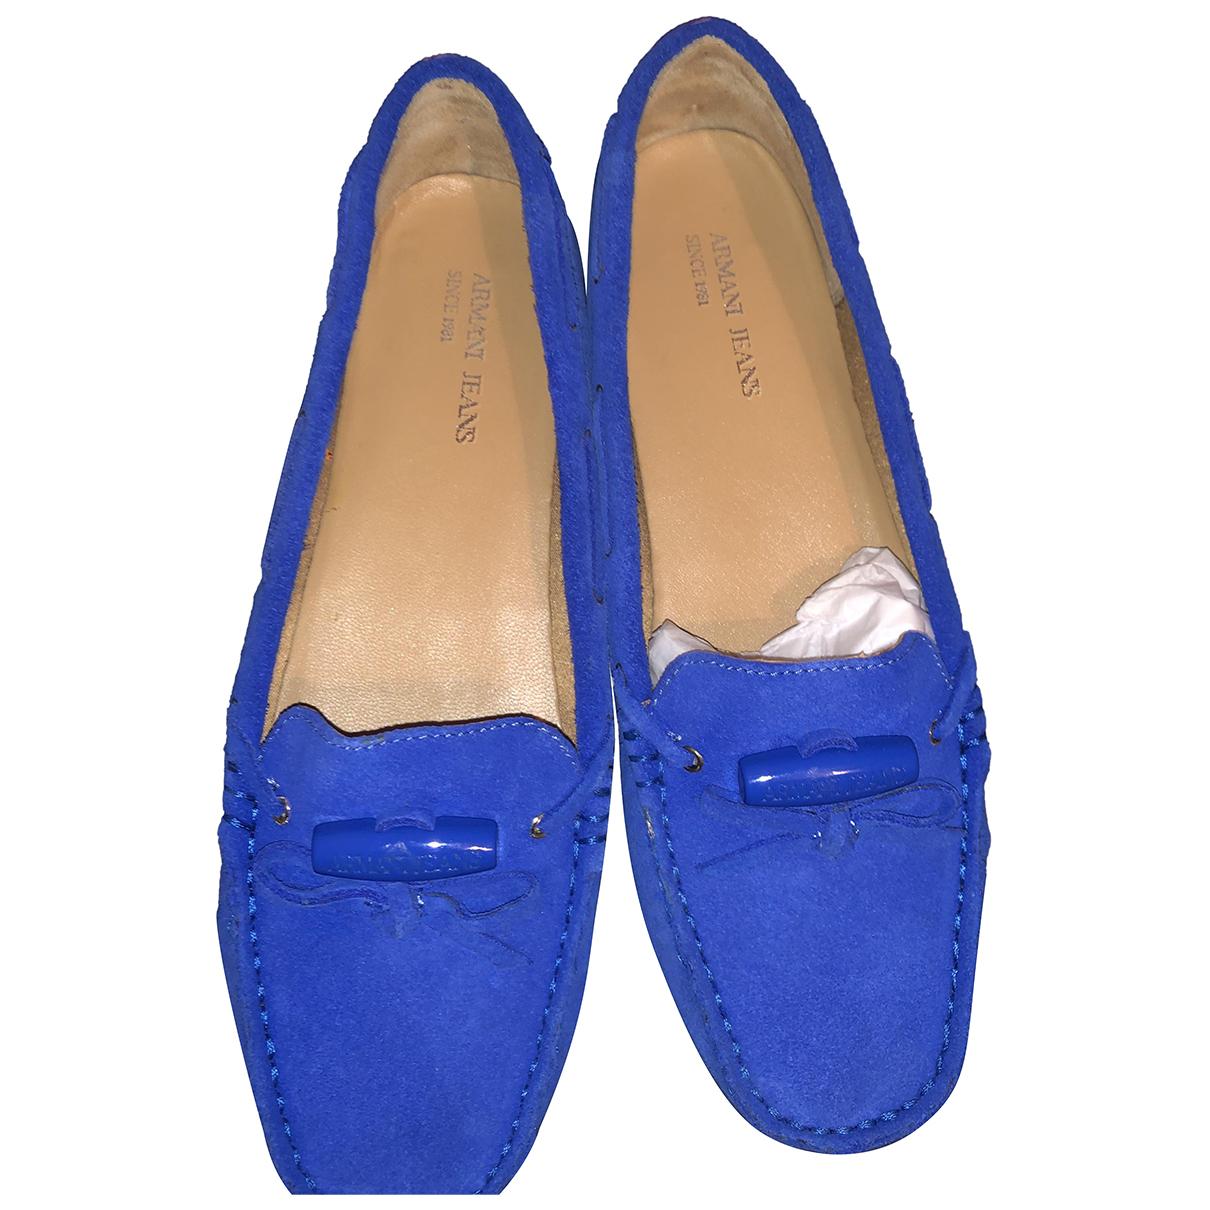 Armani Jeans N Blue Suede Flats for Women 37 EU